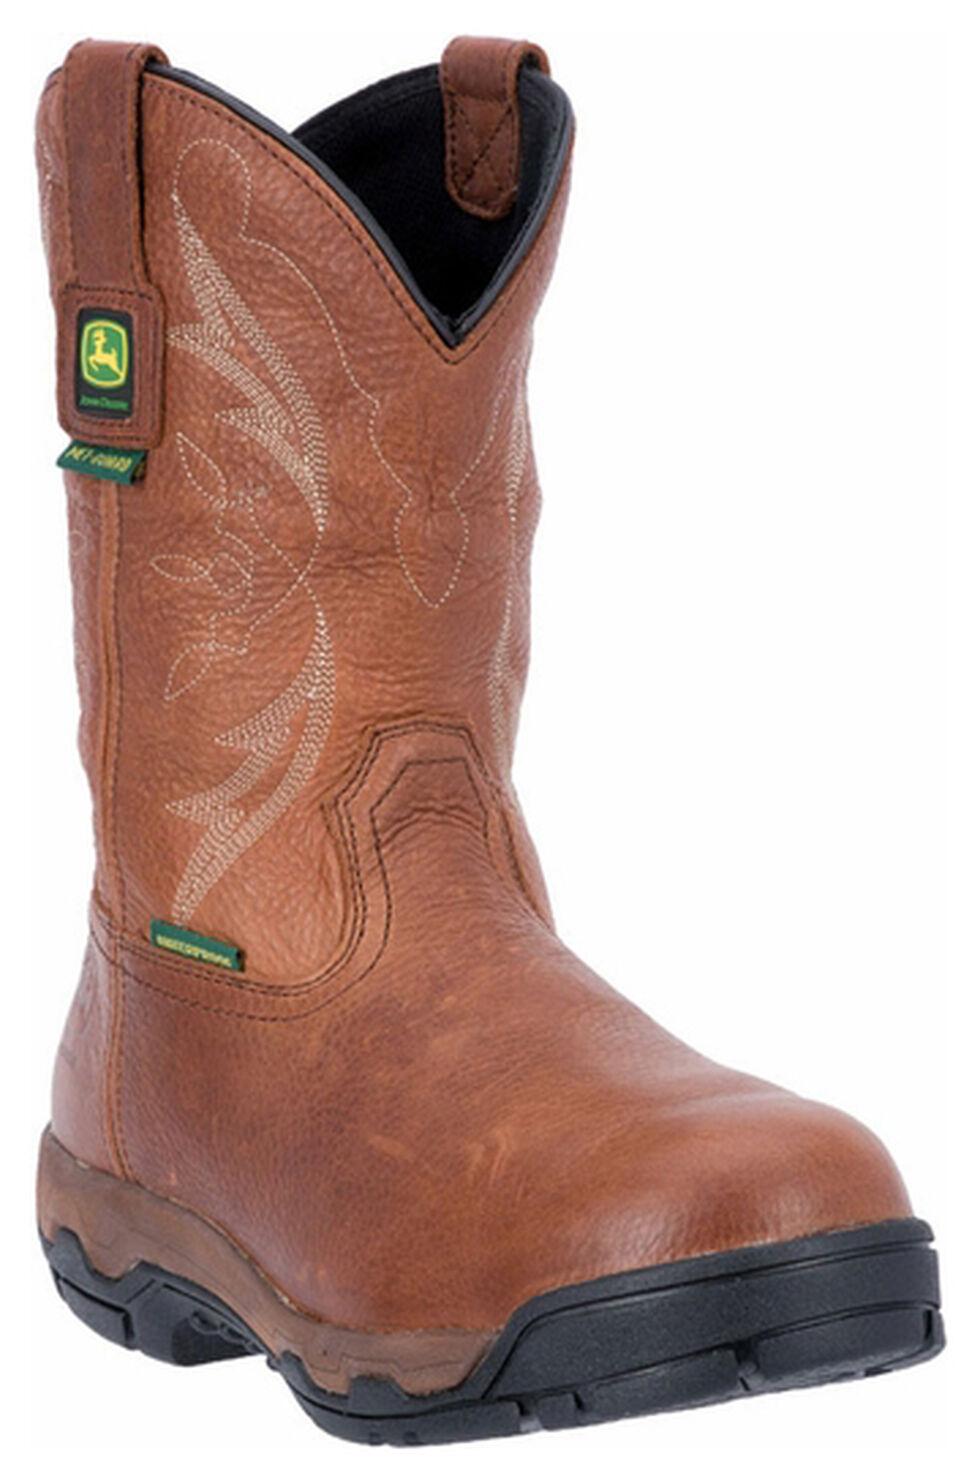 John Deere Men's Leather Pull-On Waterproof Work Boots - Aluminum Toe, Cinnamon, hi-res